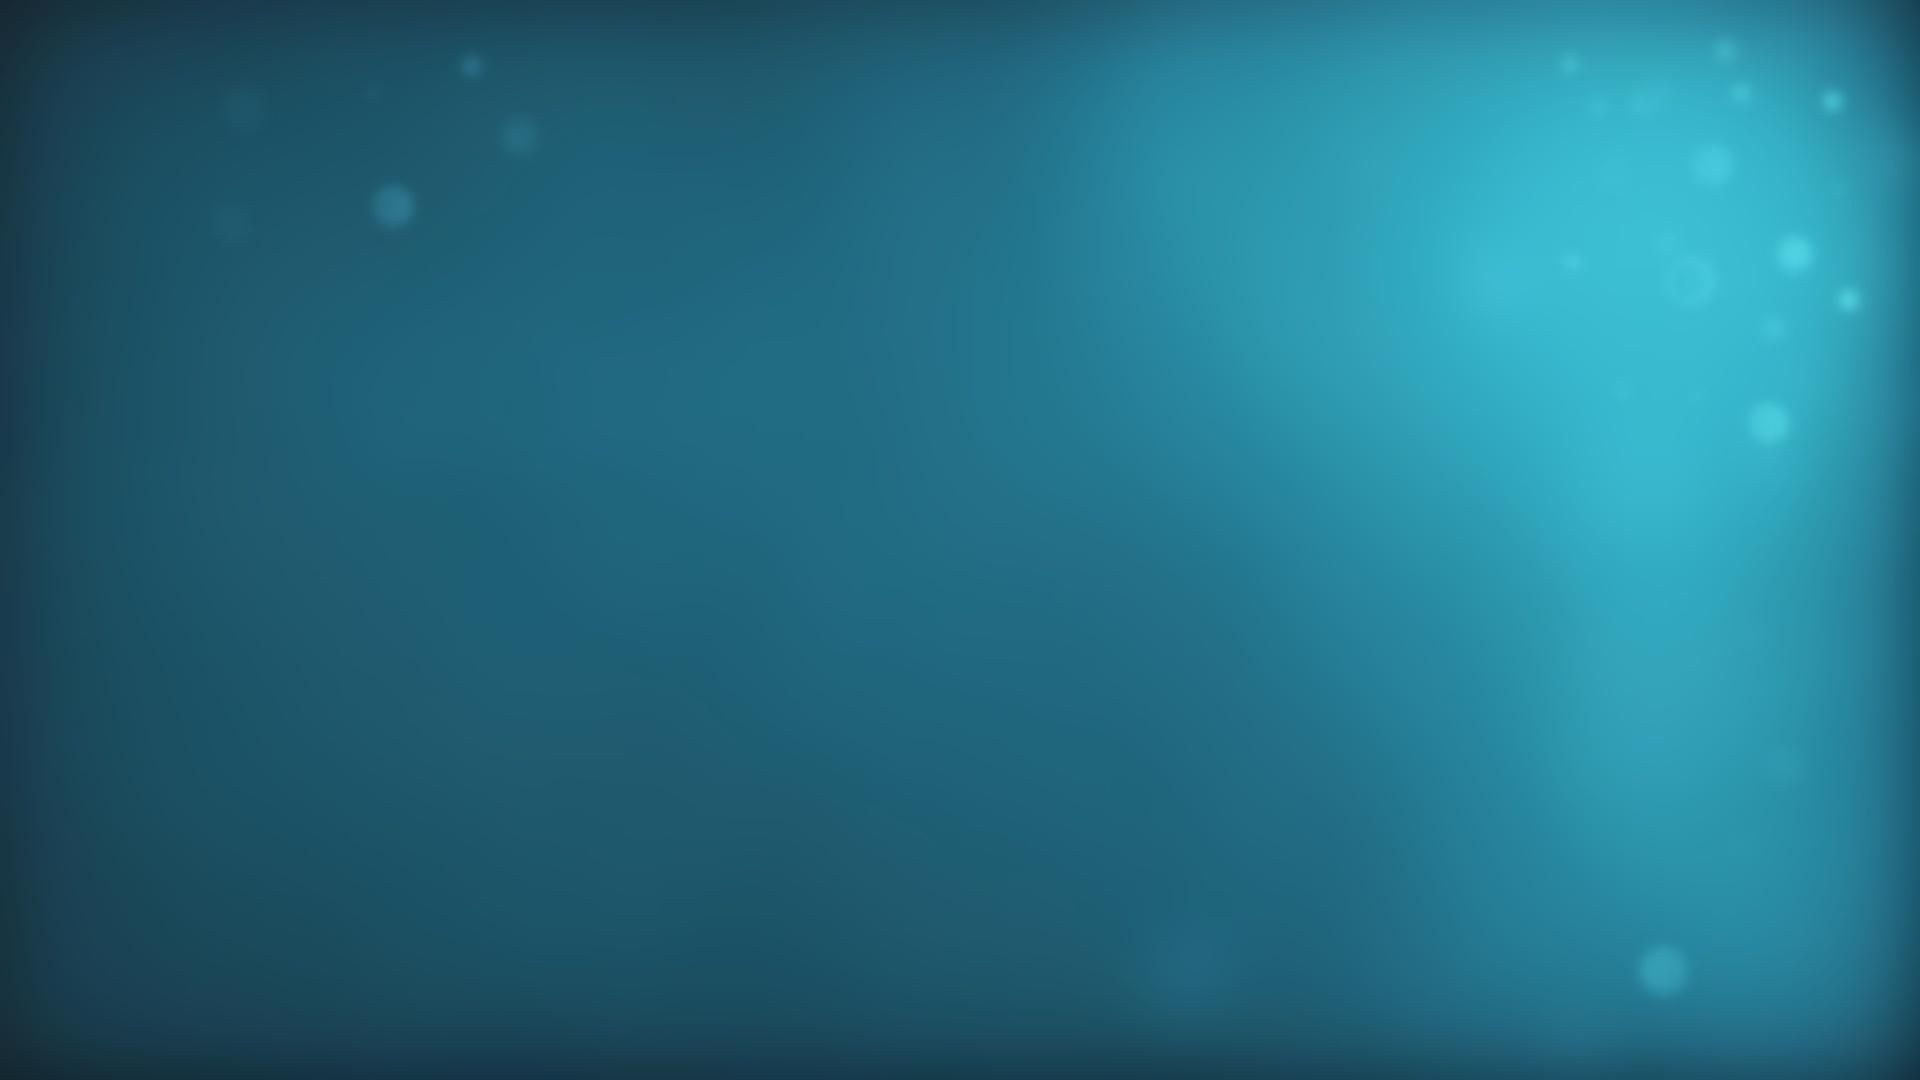 Fond D Ecran Neutre - Fond d écran